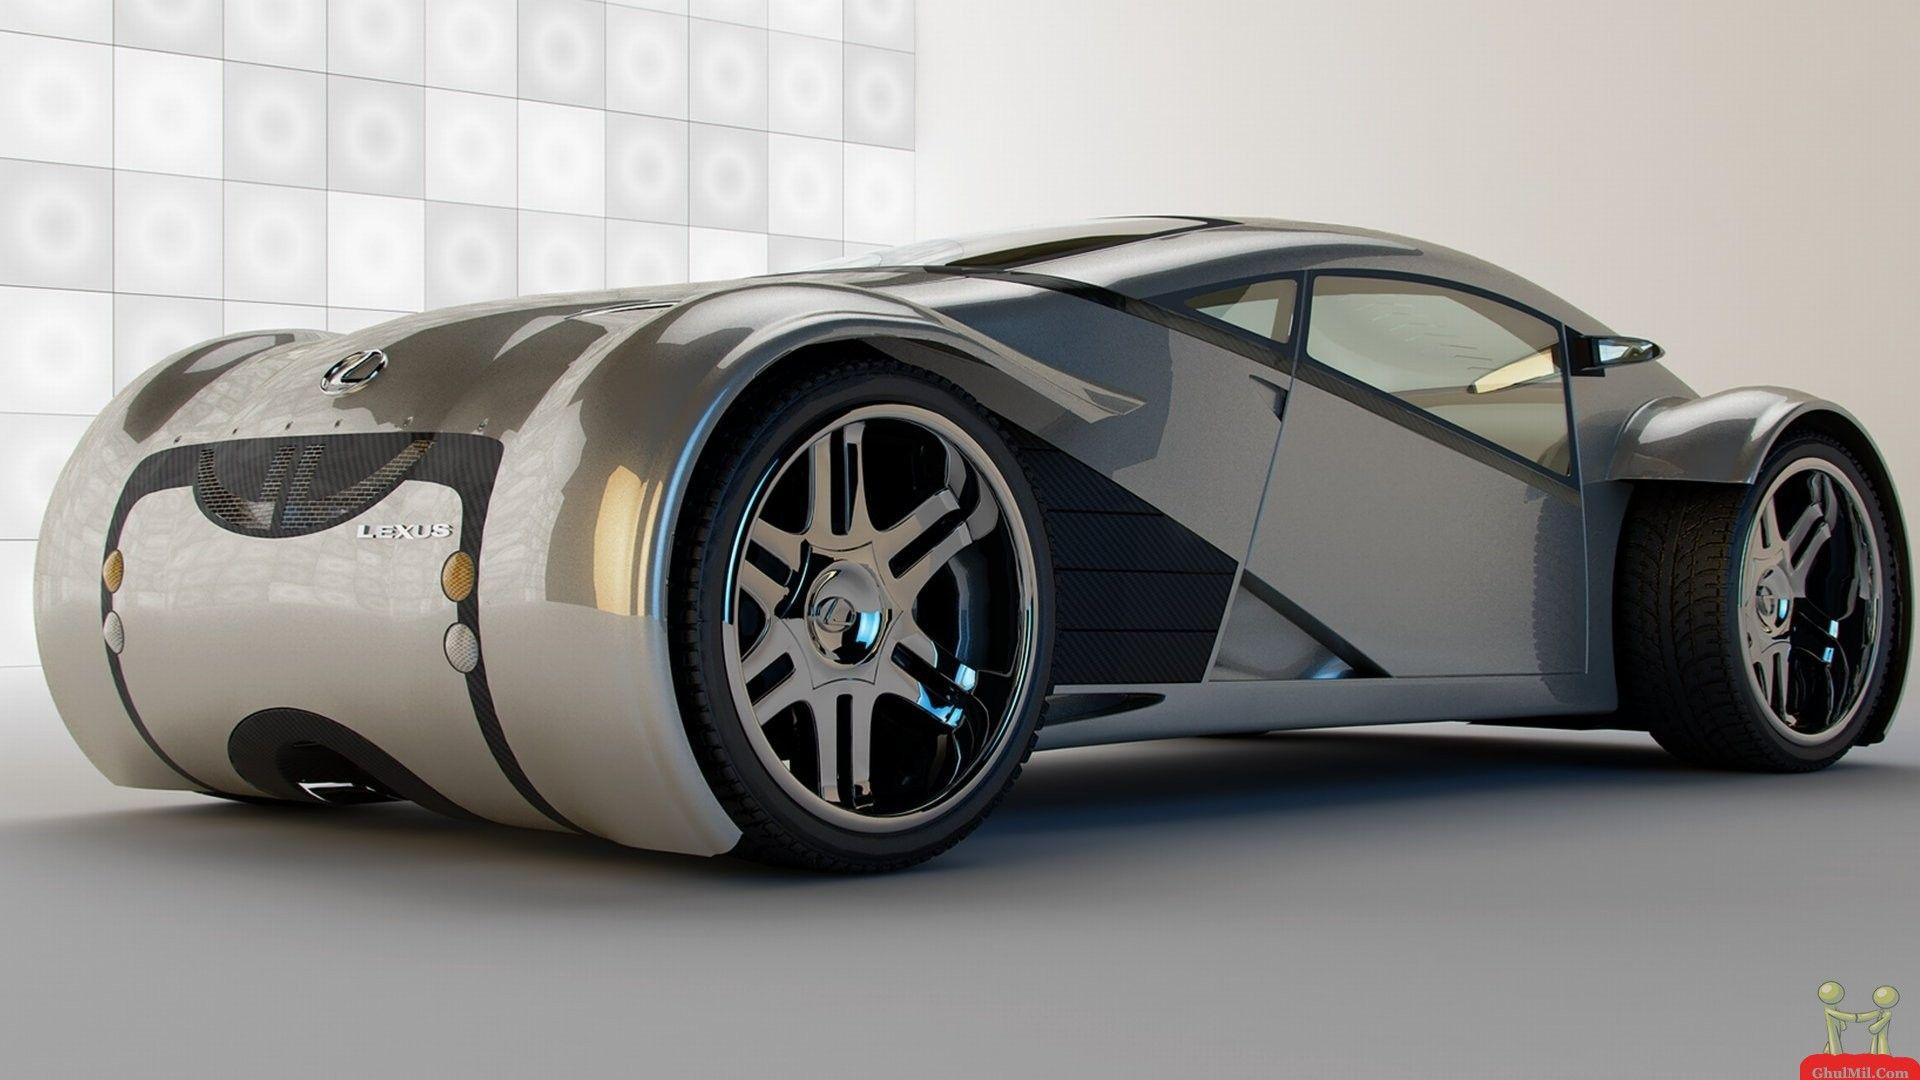 Amazing Cars Superb Amazing Lexus Car Wallpaper Cars